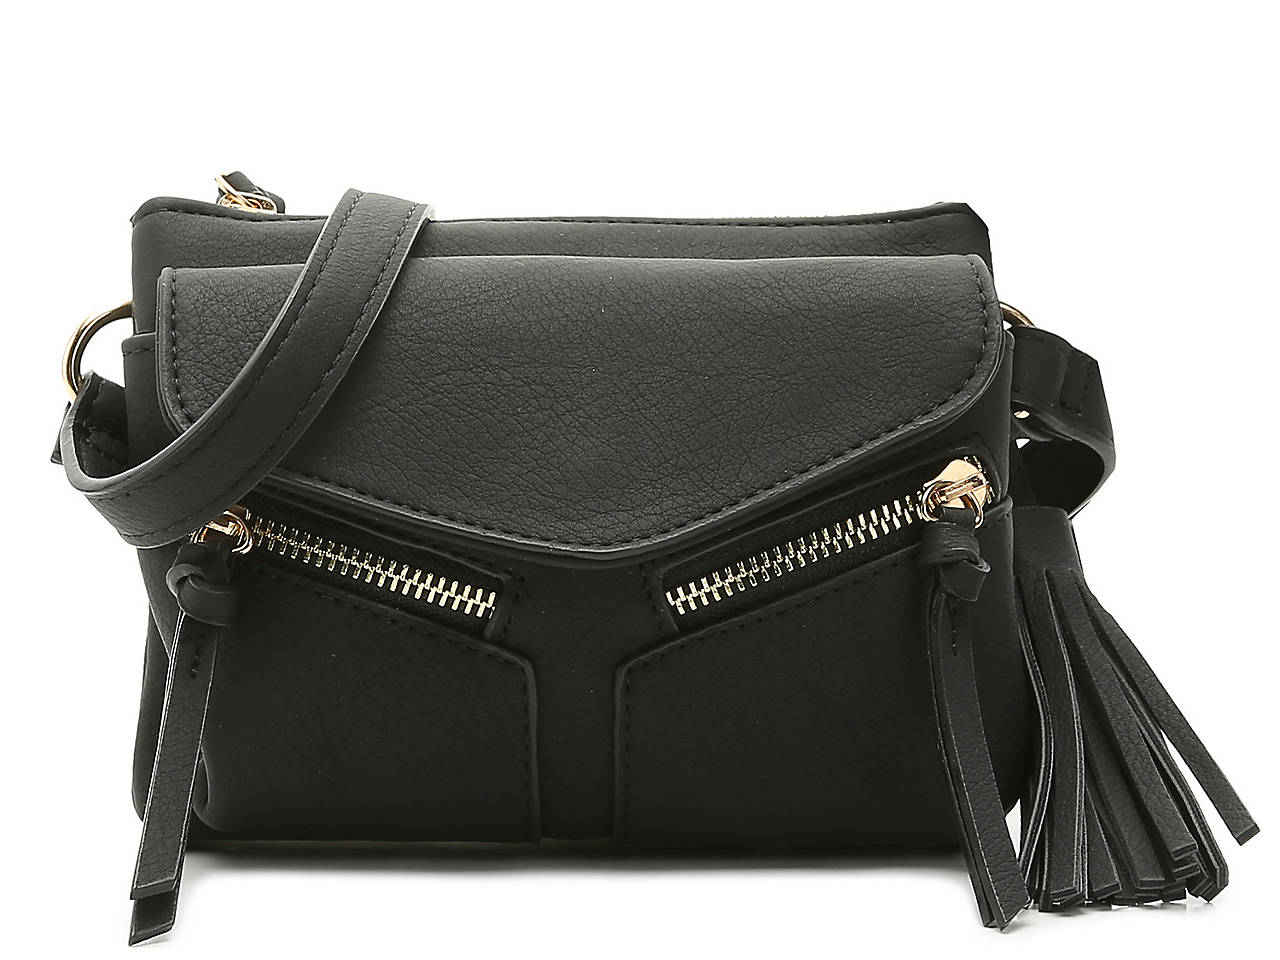 Violet Ray Mini Leanna Crossbody Bag Women s Handbags   Accessories ... f64f19ba13dfa